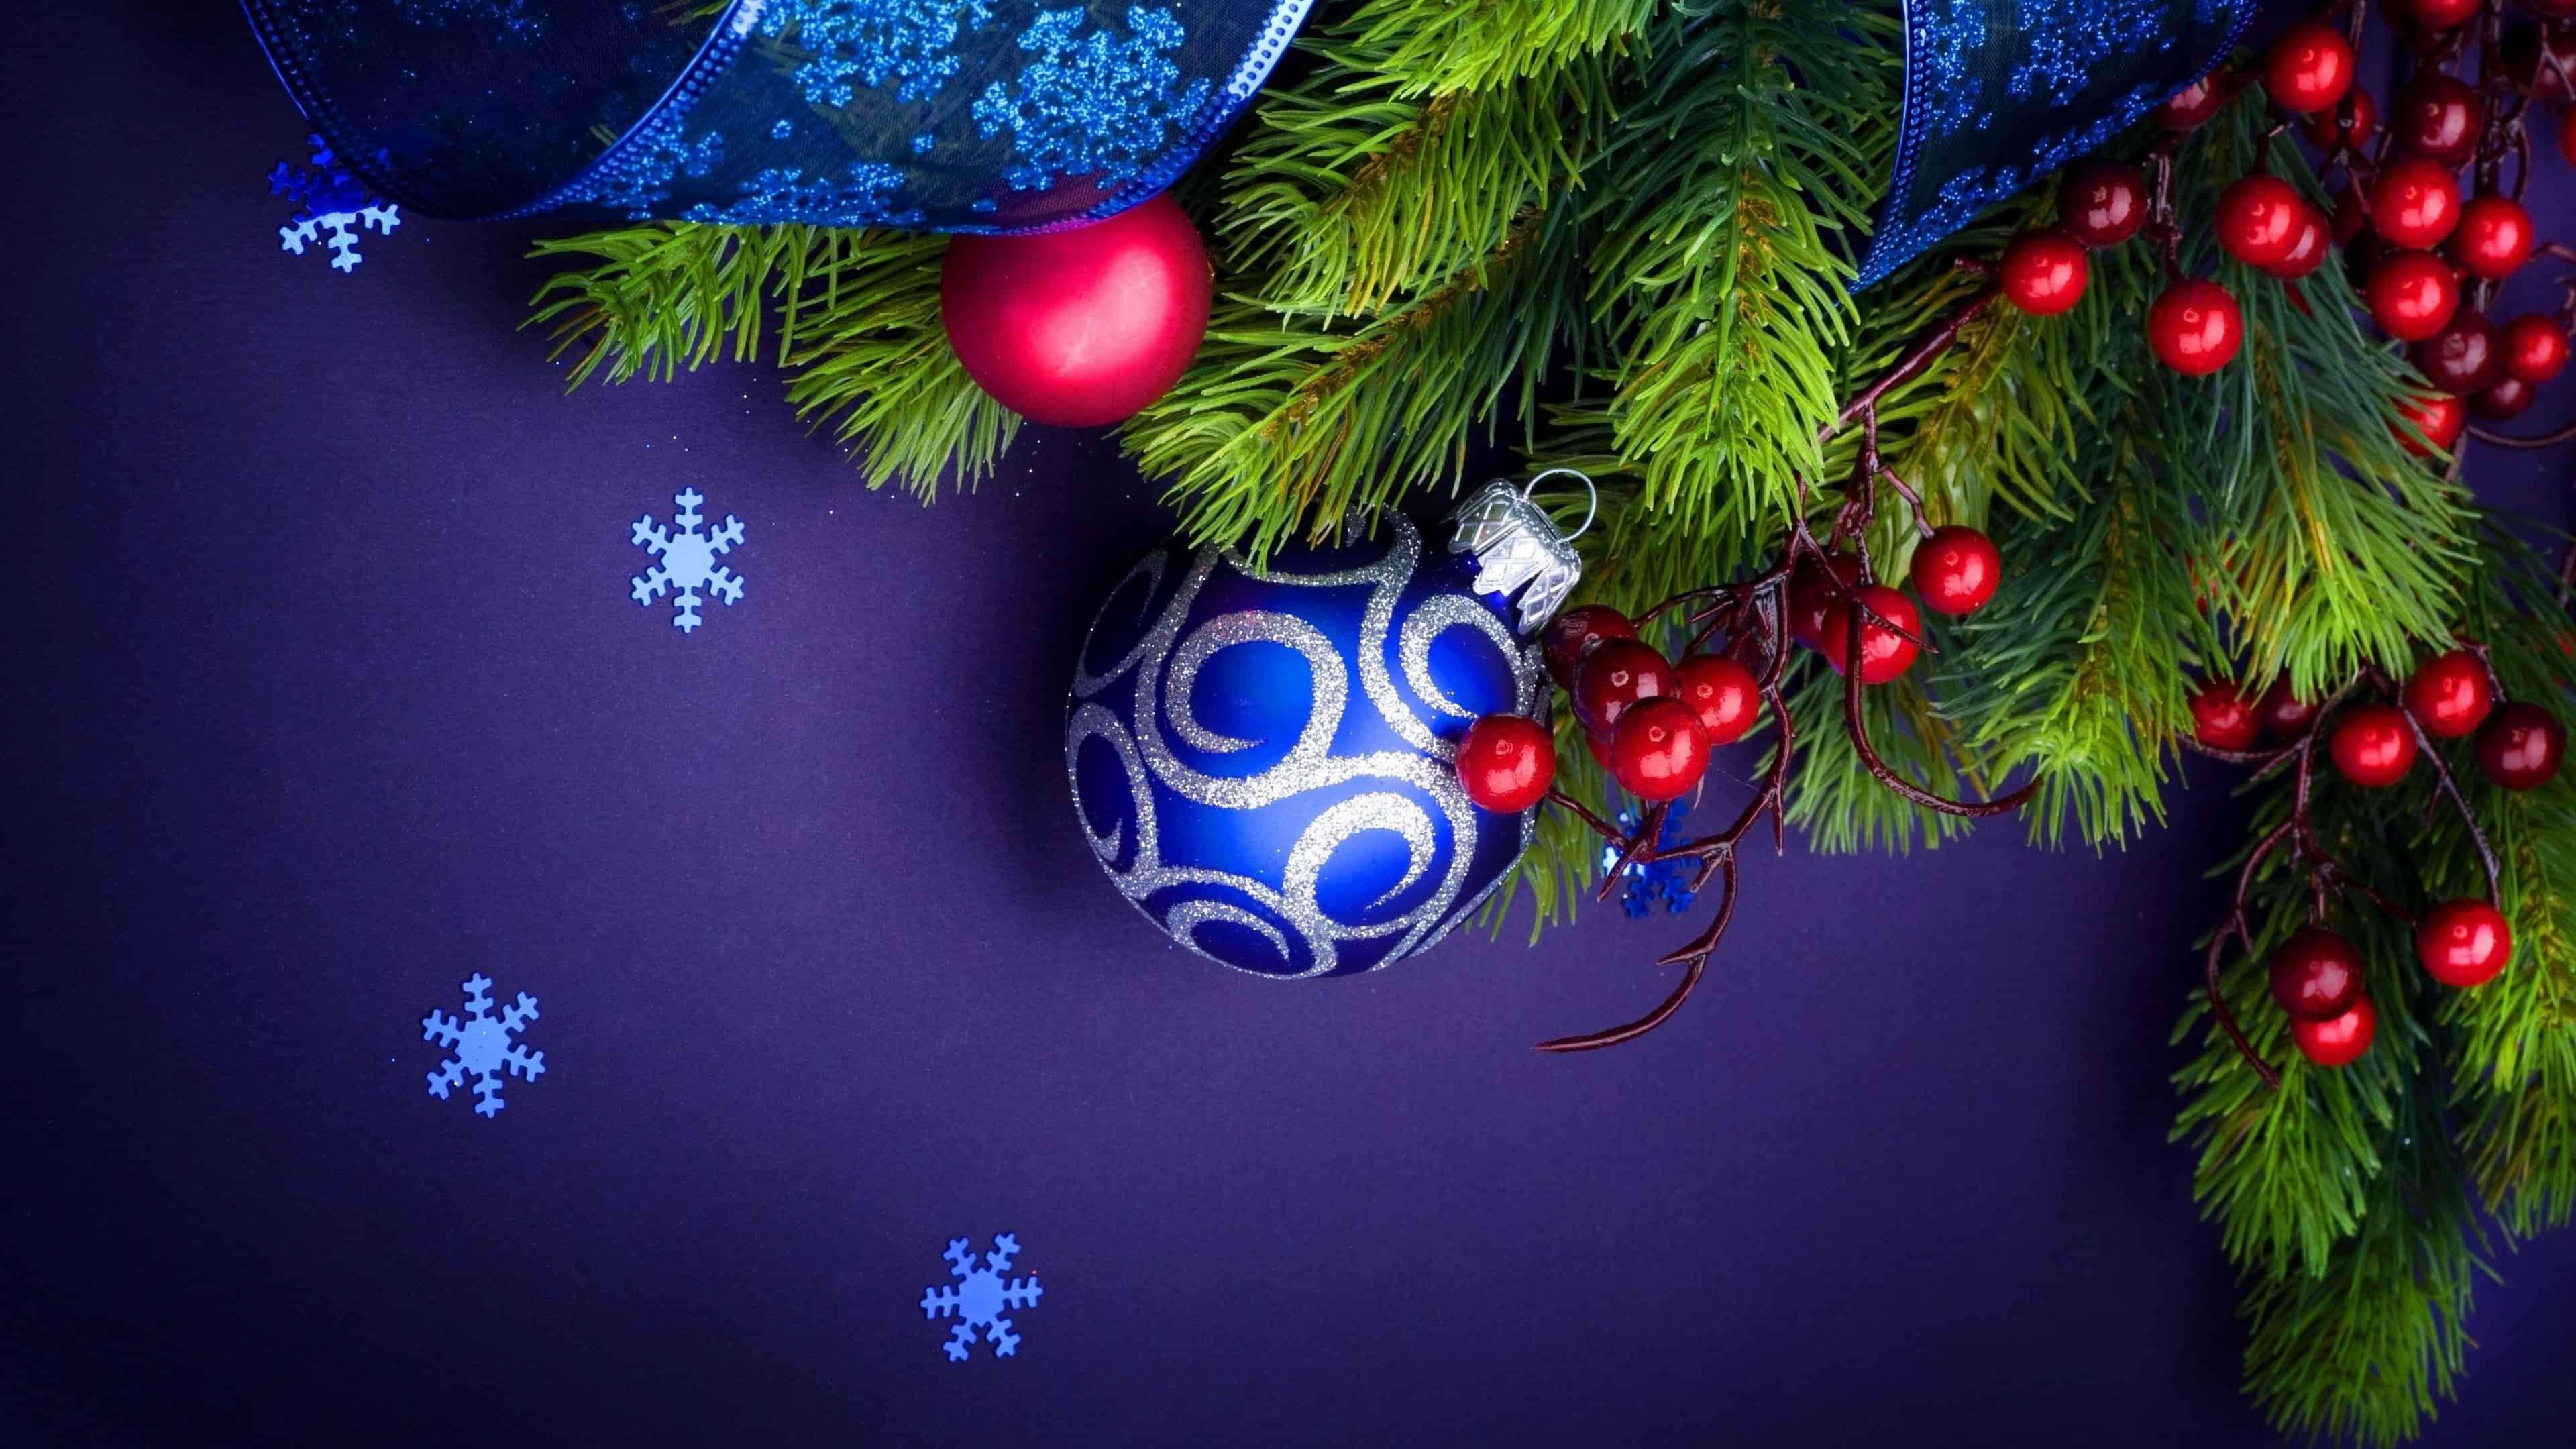 christmas decorations and snowflakes uhd 4k wallpaper